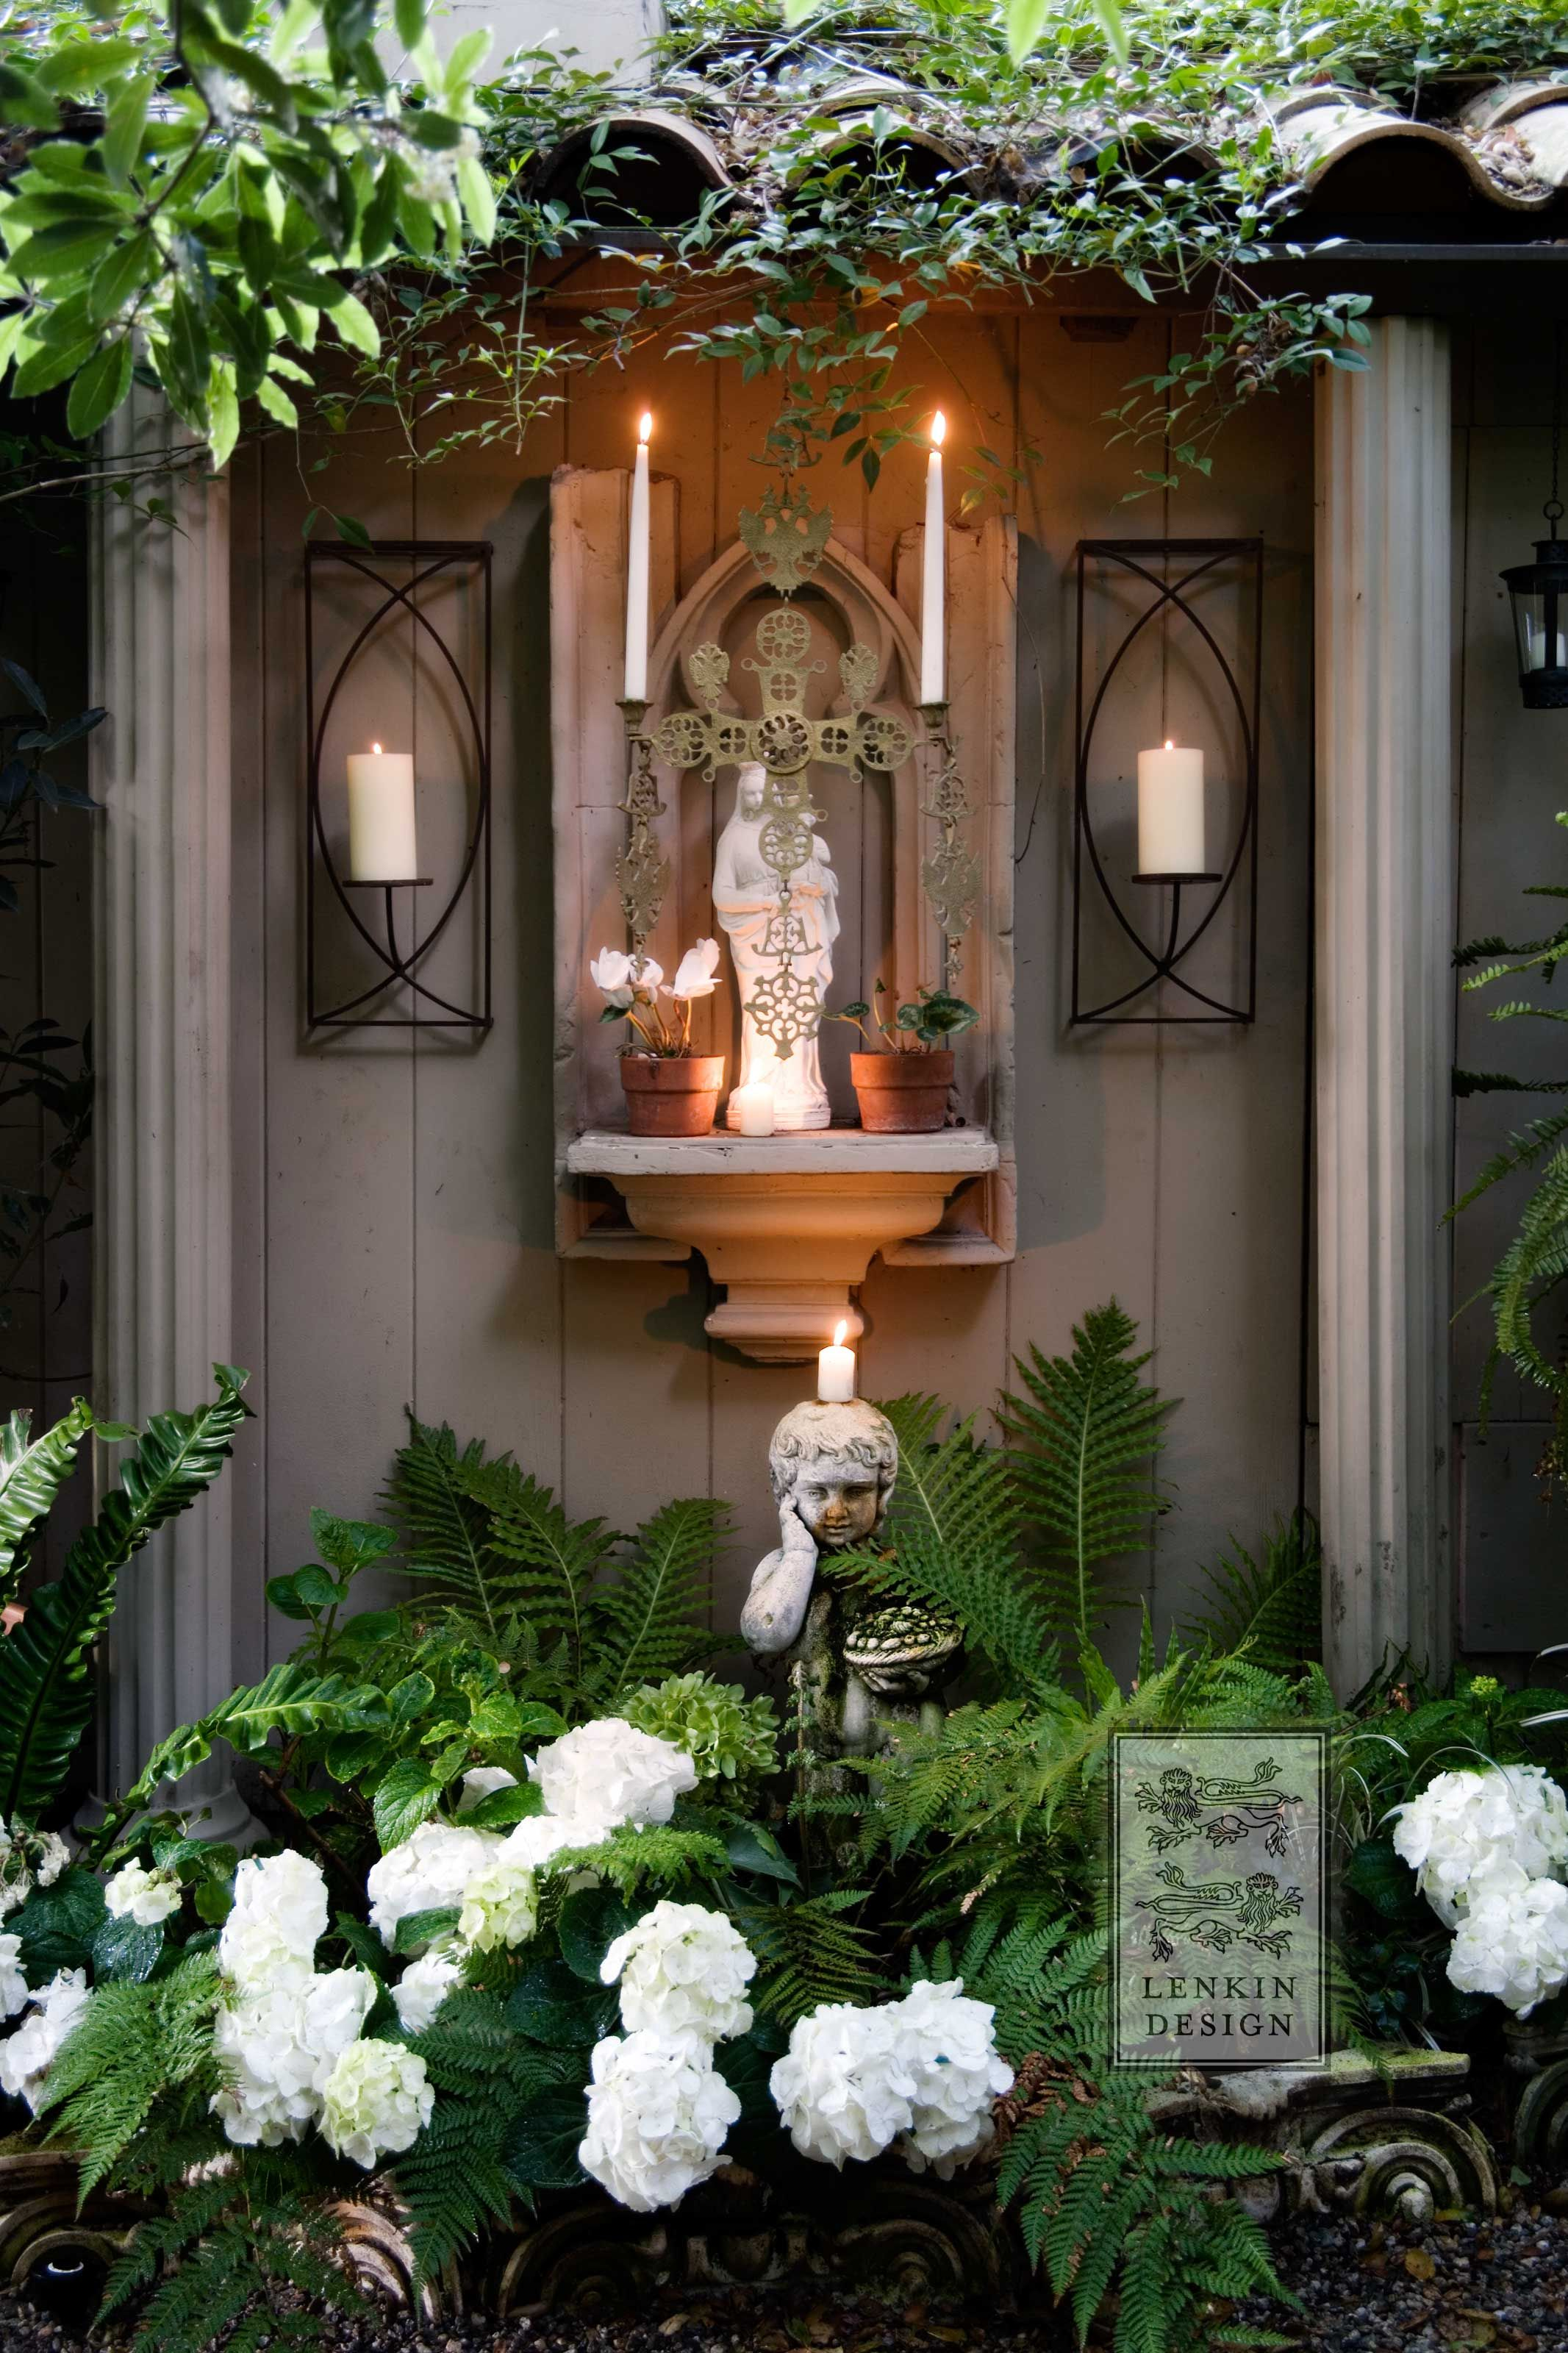 Bringing faith into the garden. Lagunita Heaven - Lenkin Design ...